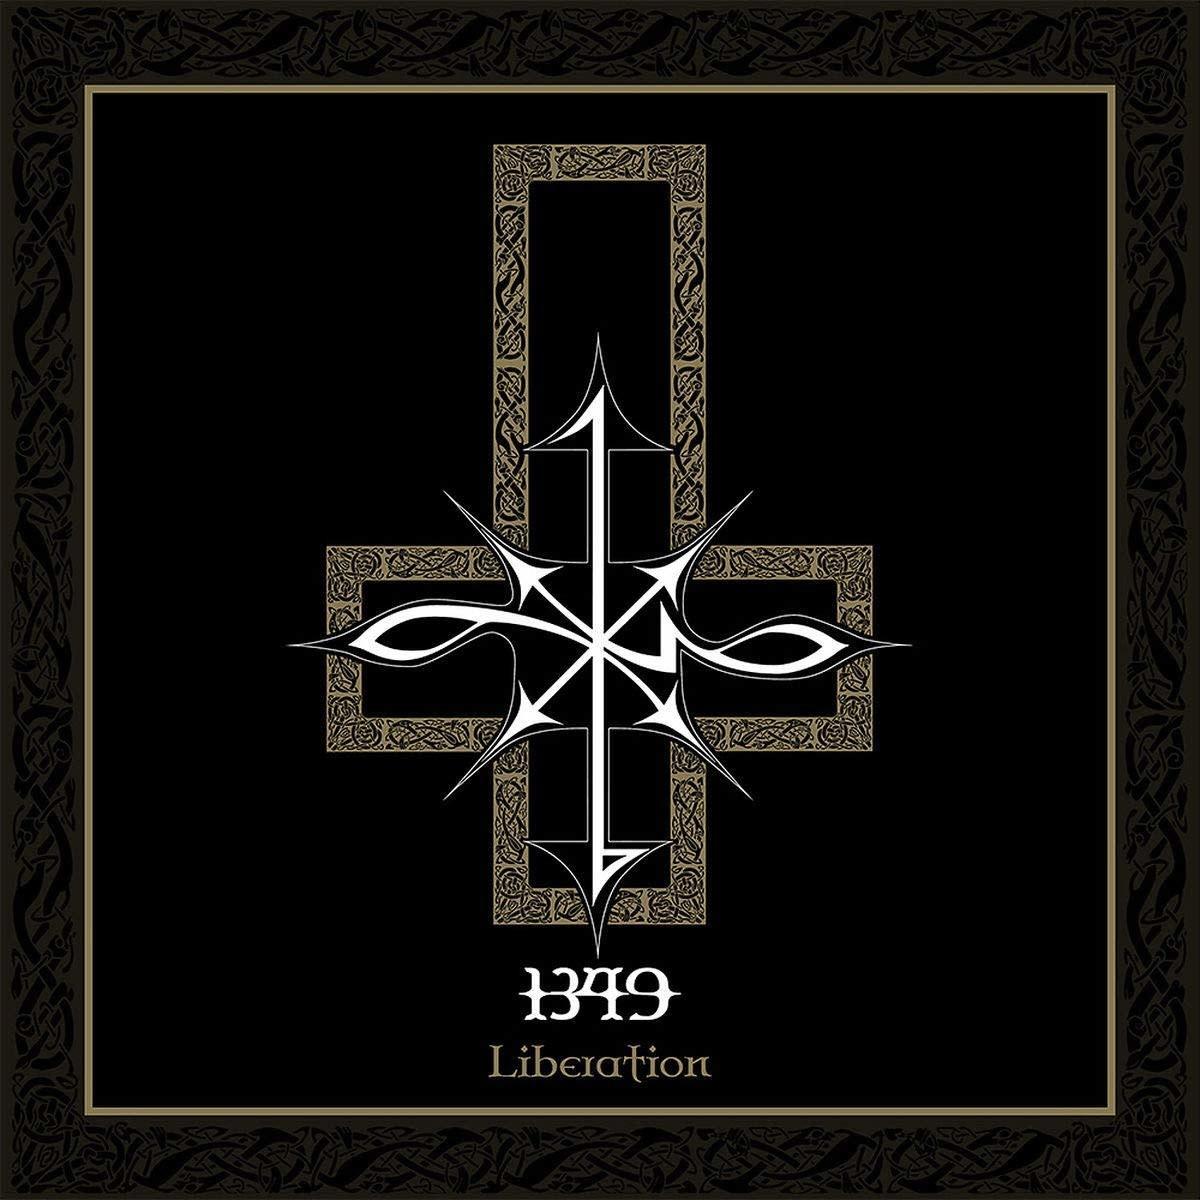 1349 – Liberation